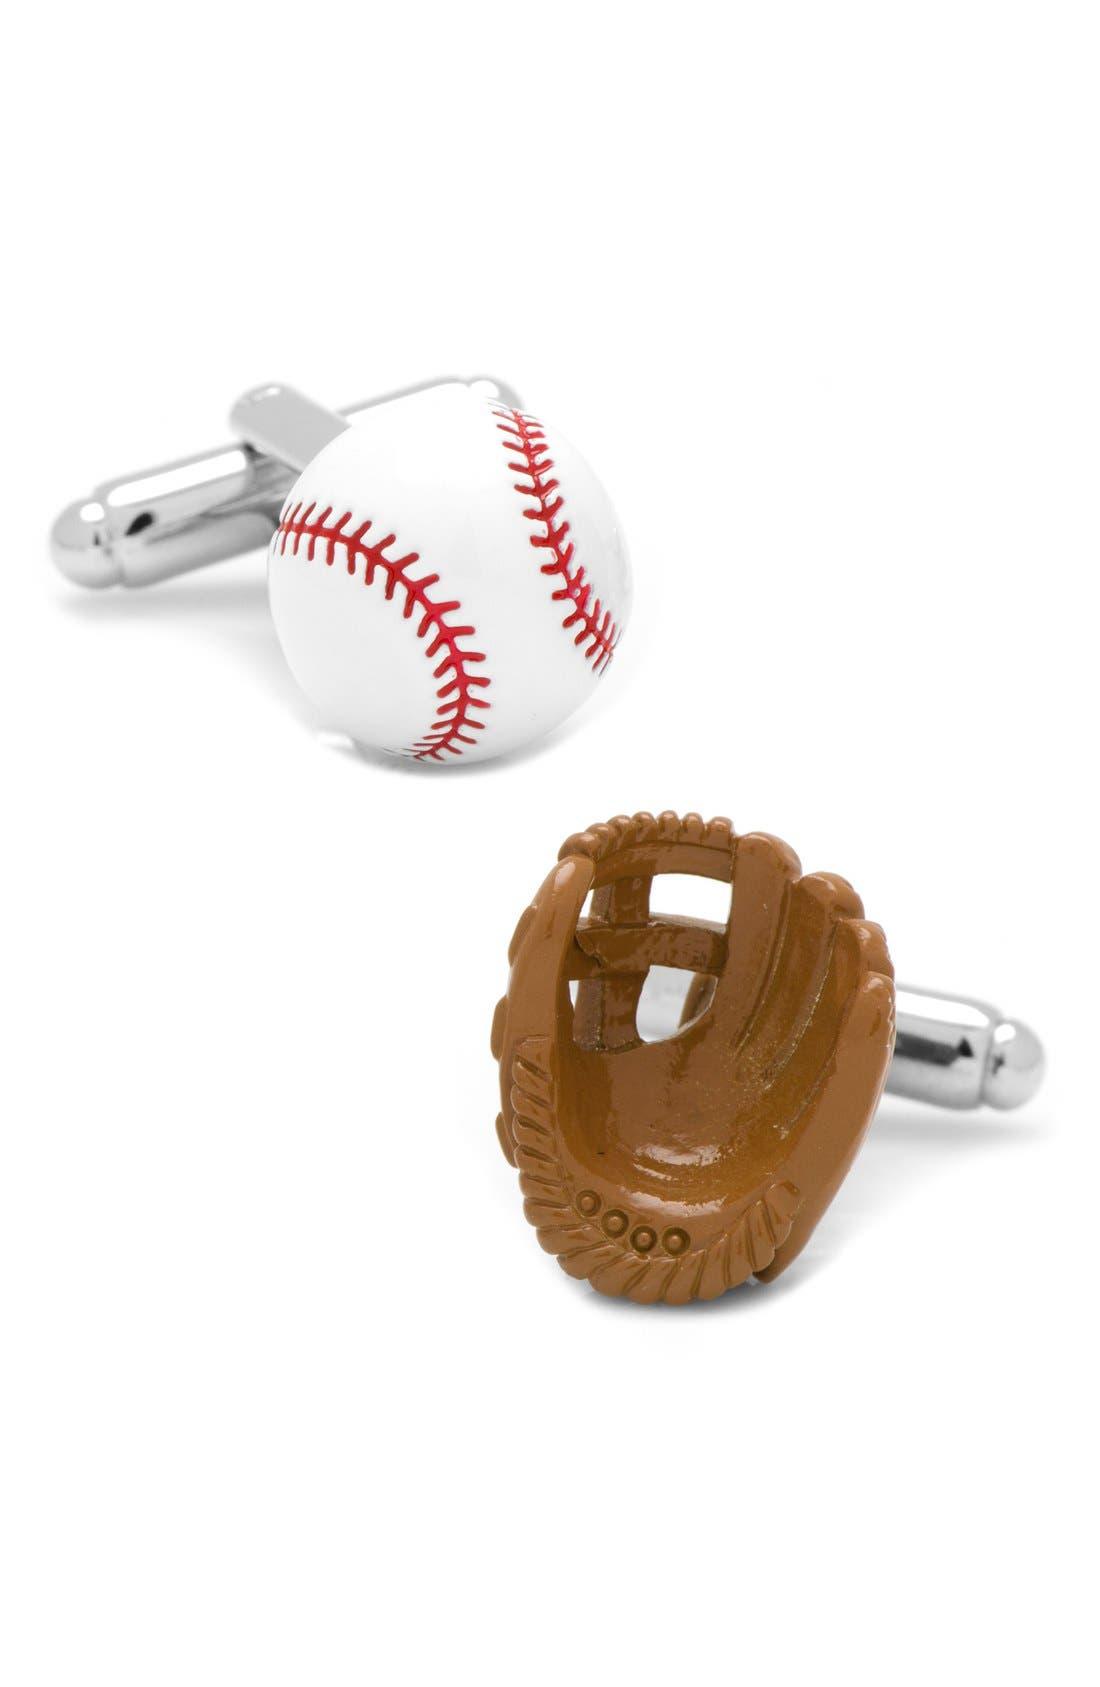 Baseball & Glove Cuff Links,                         Main,                         color, White Multi